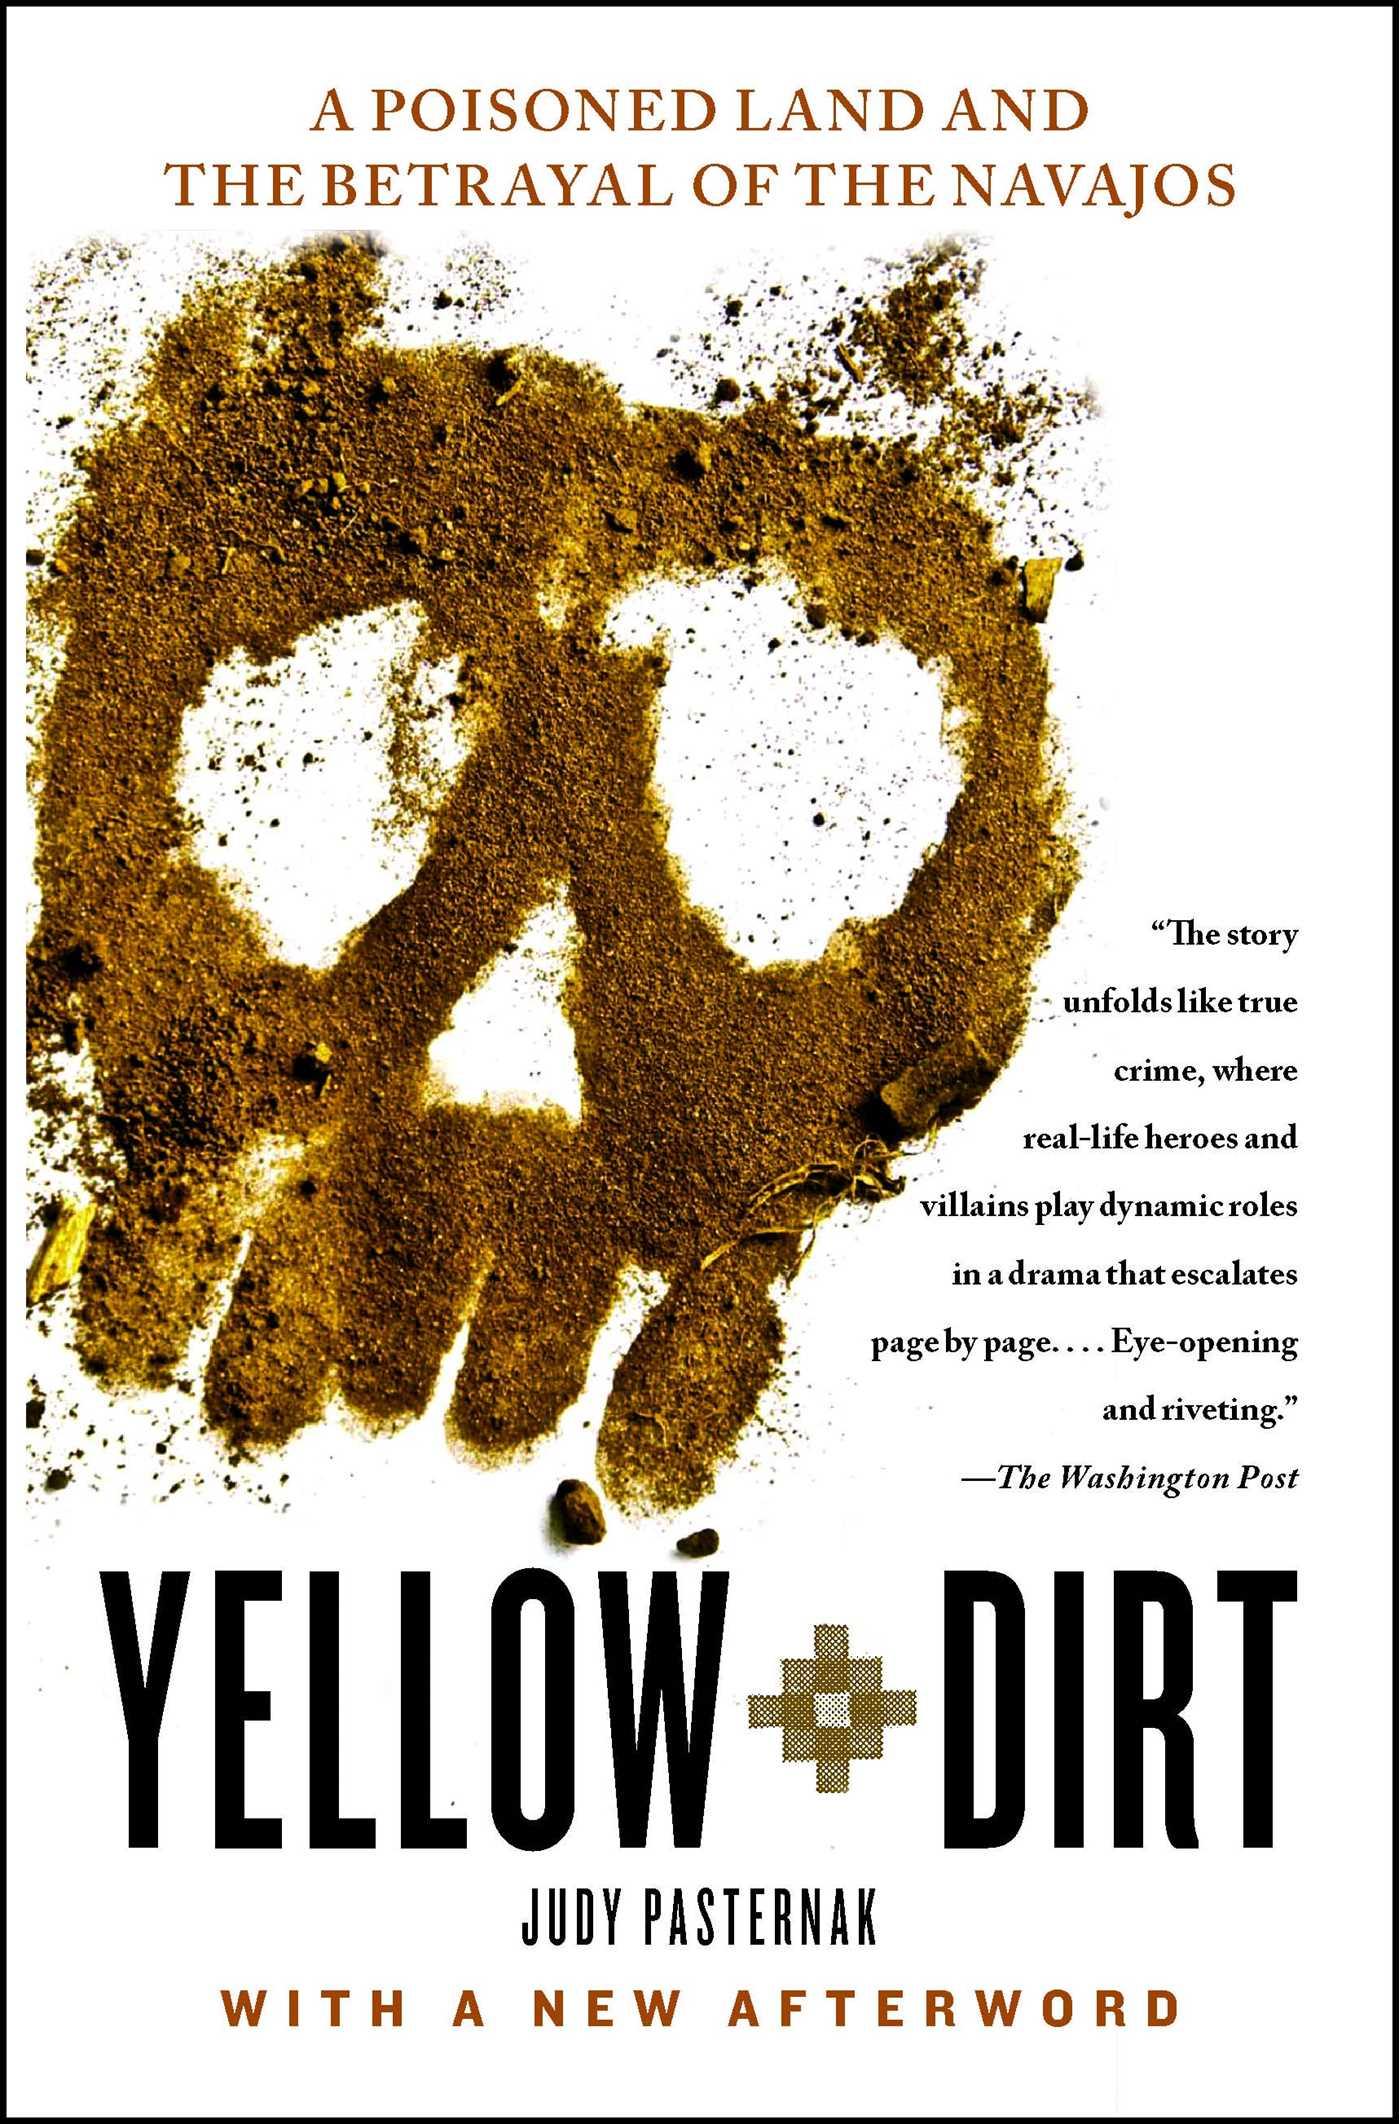 Yellow dirt 9781439100462 hr